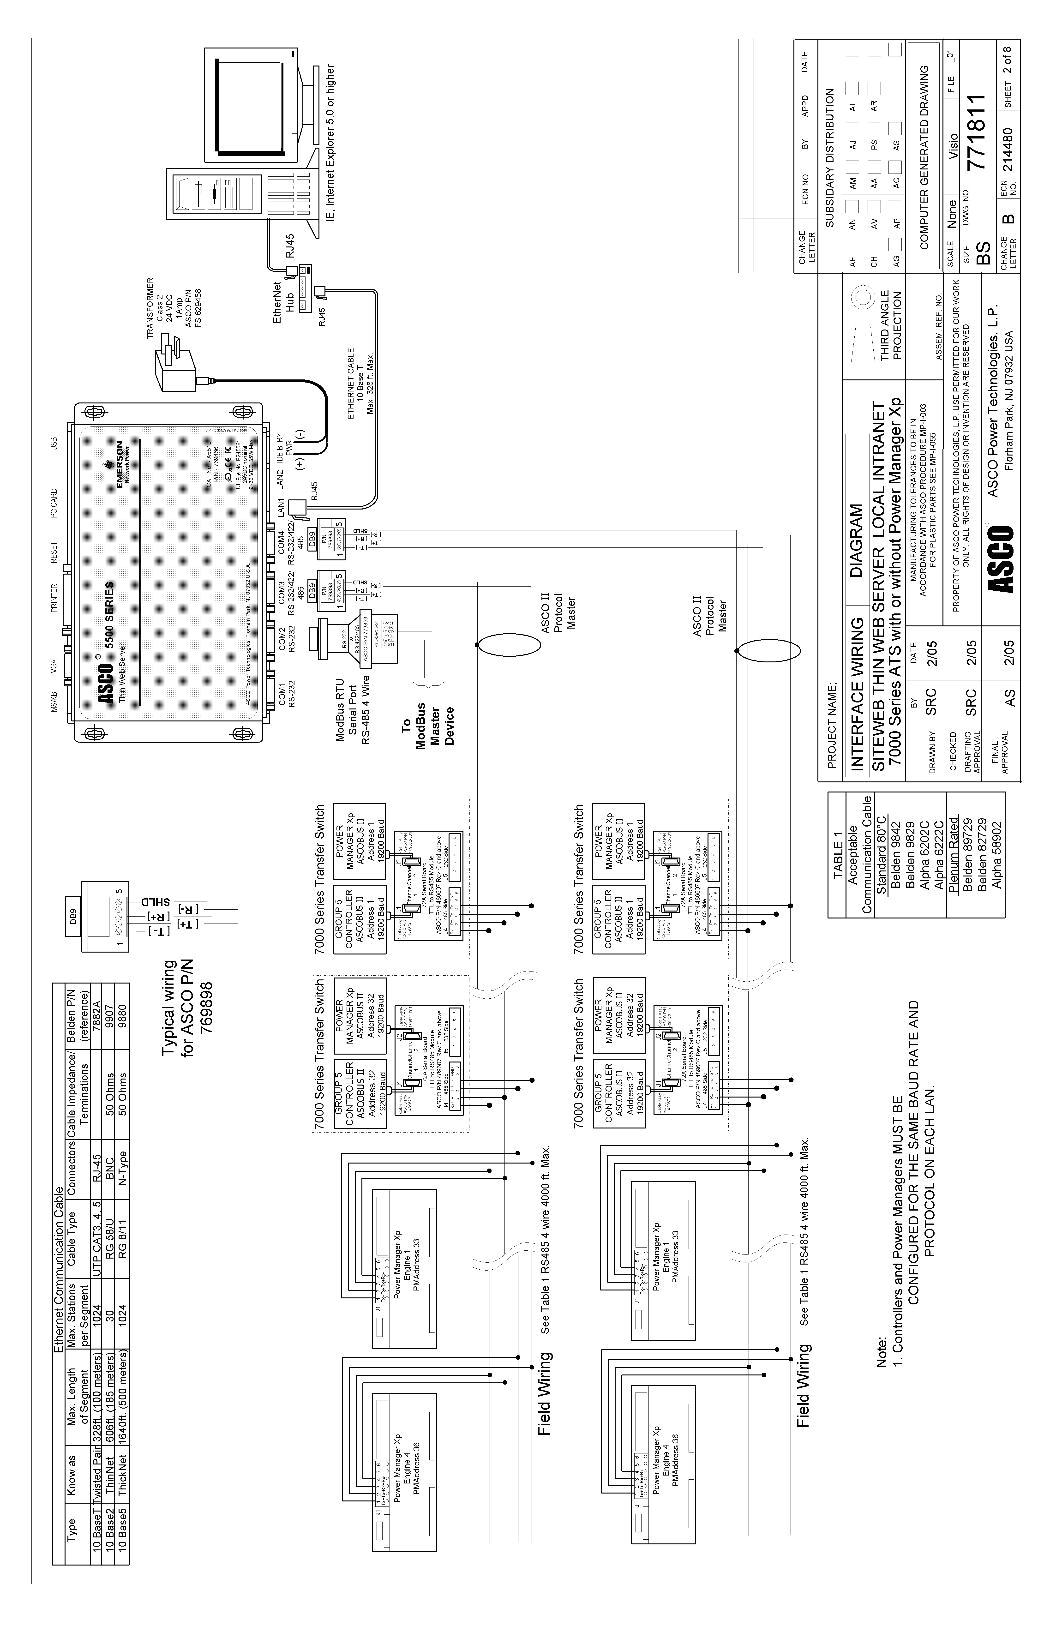 asco wiring diagrams wiring diagram mega asco wiring diagram motor control